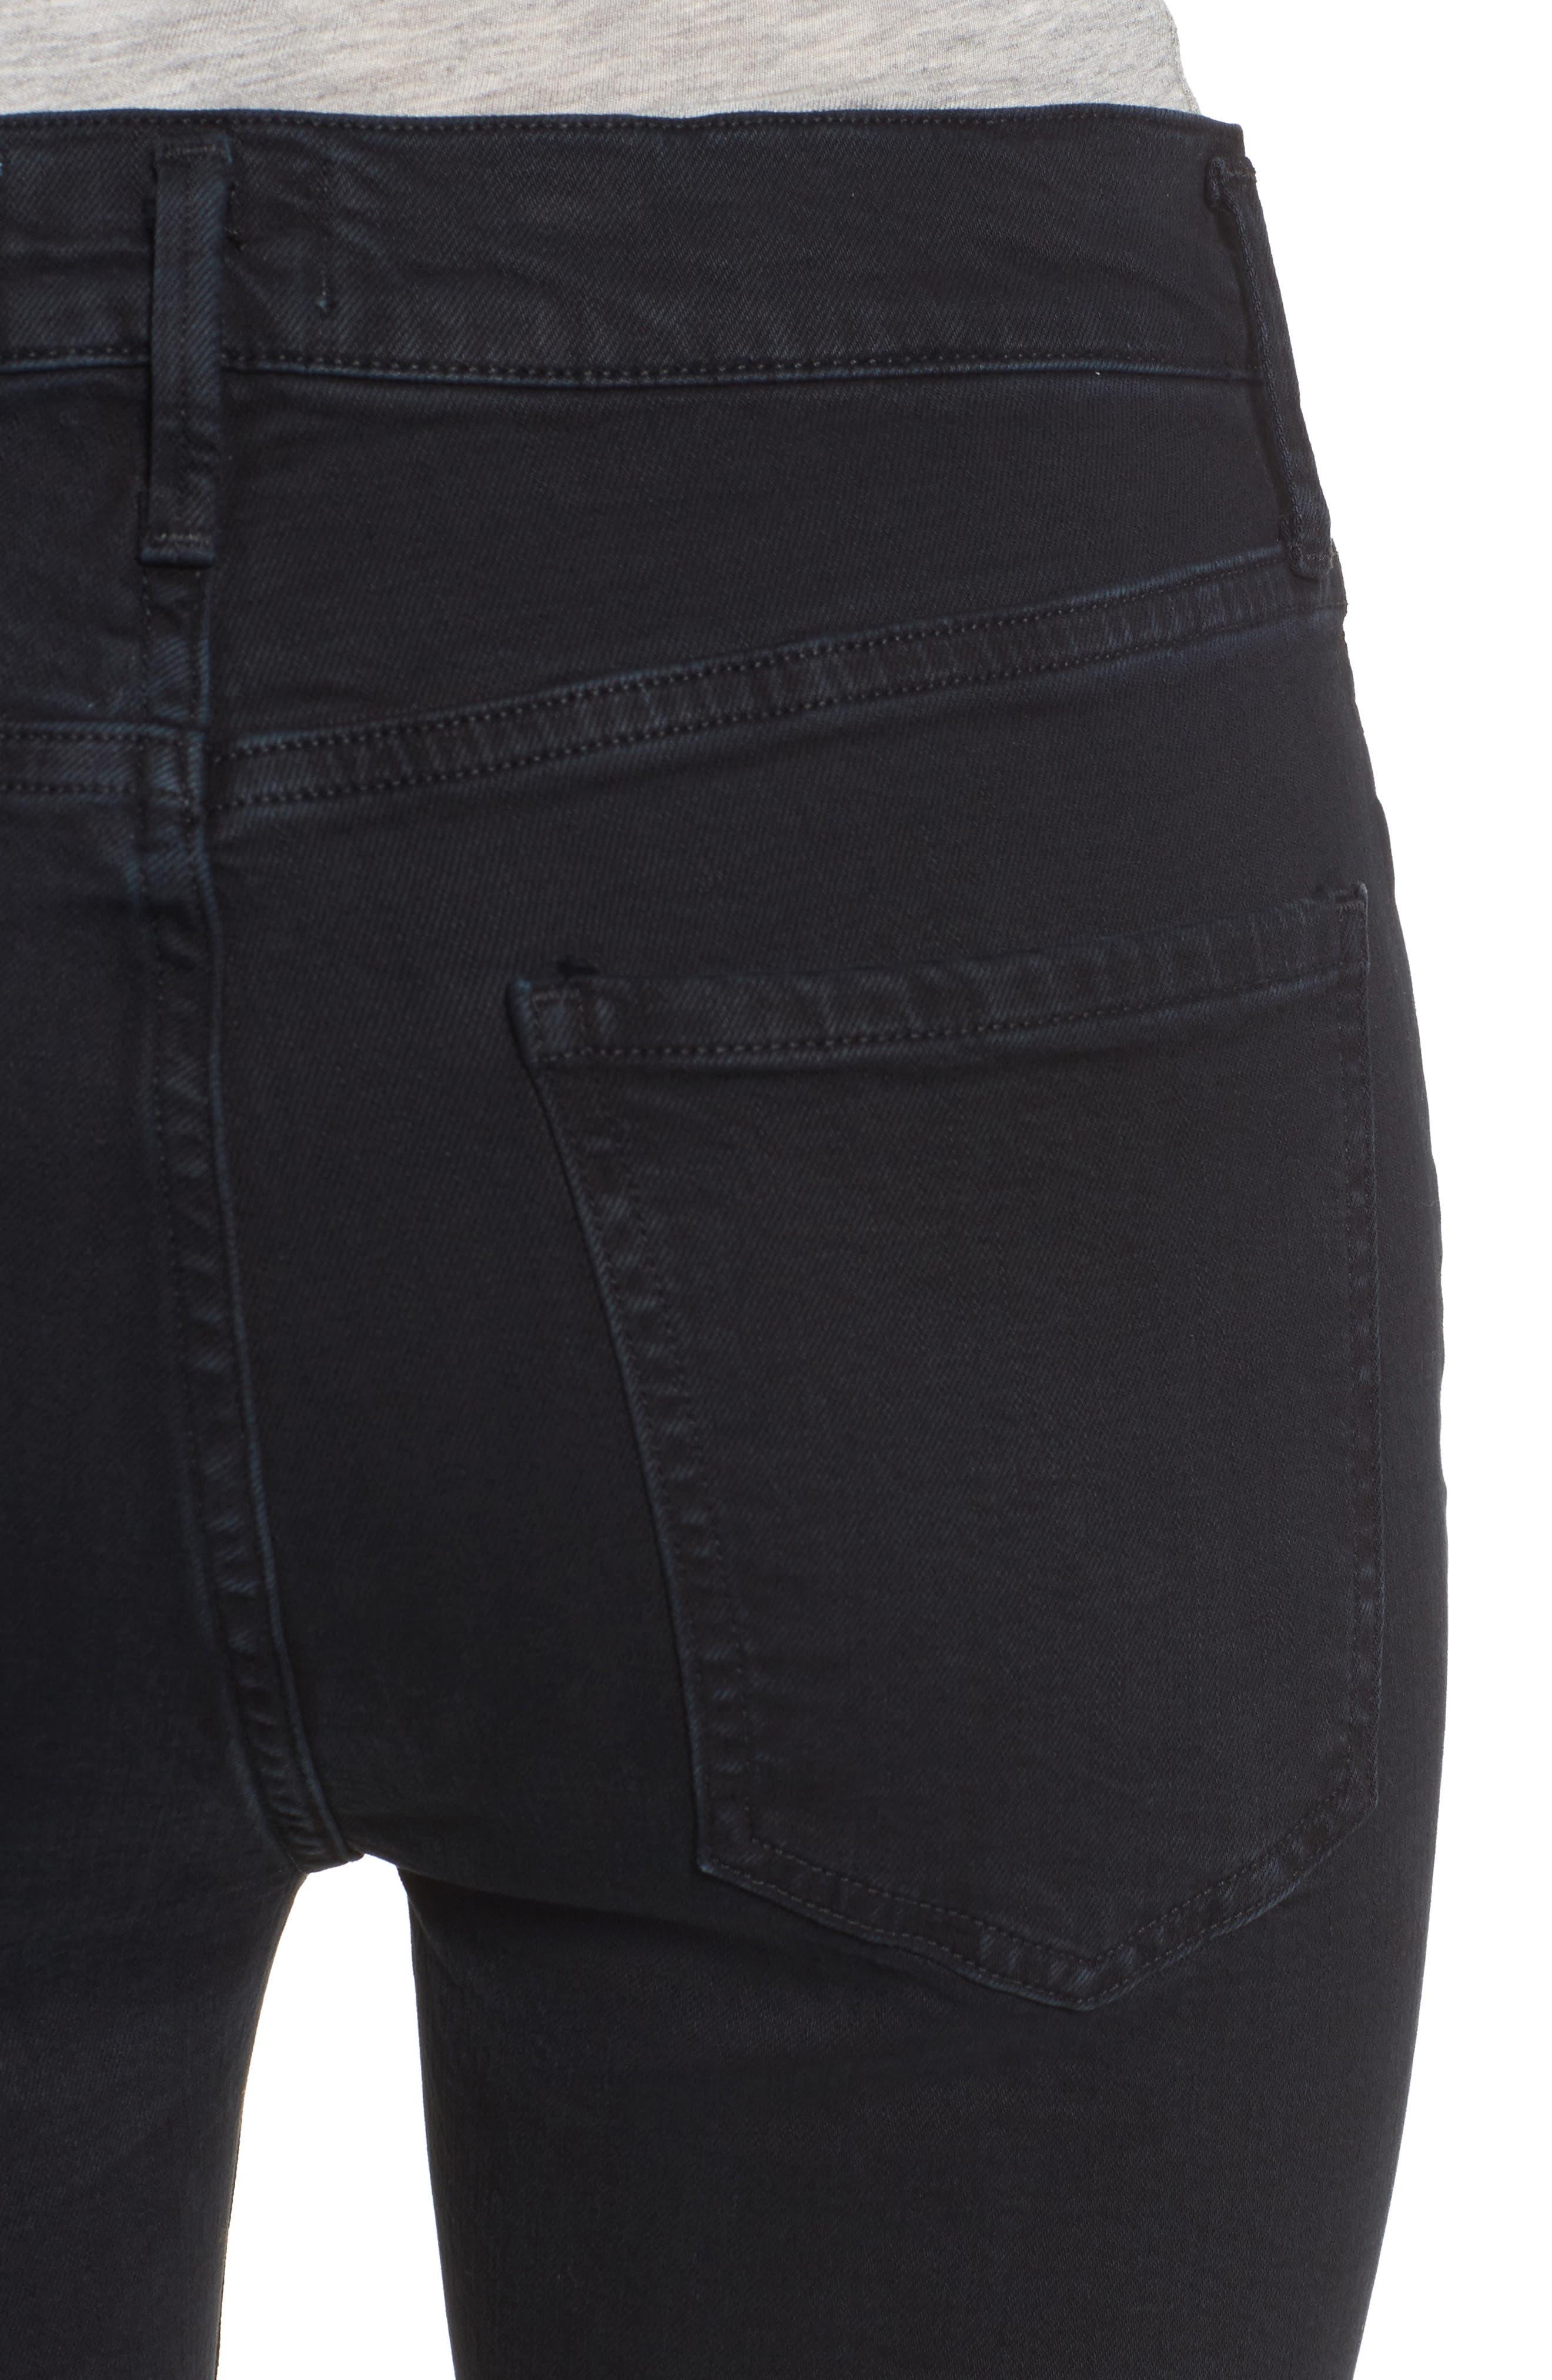 Alternate Image 4  - AGOLDE Sophie Crop High Rise Skinny Jeans (Princeton)